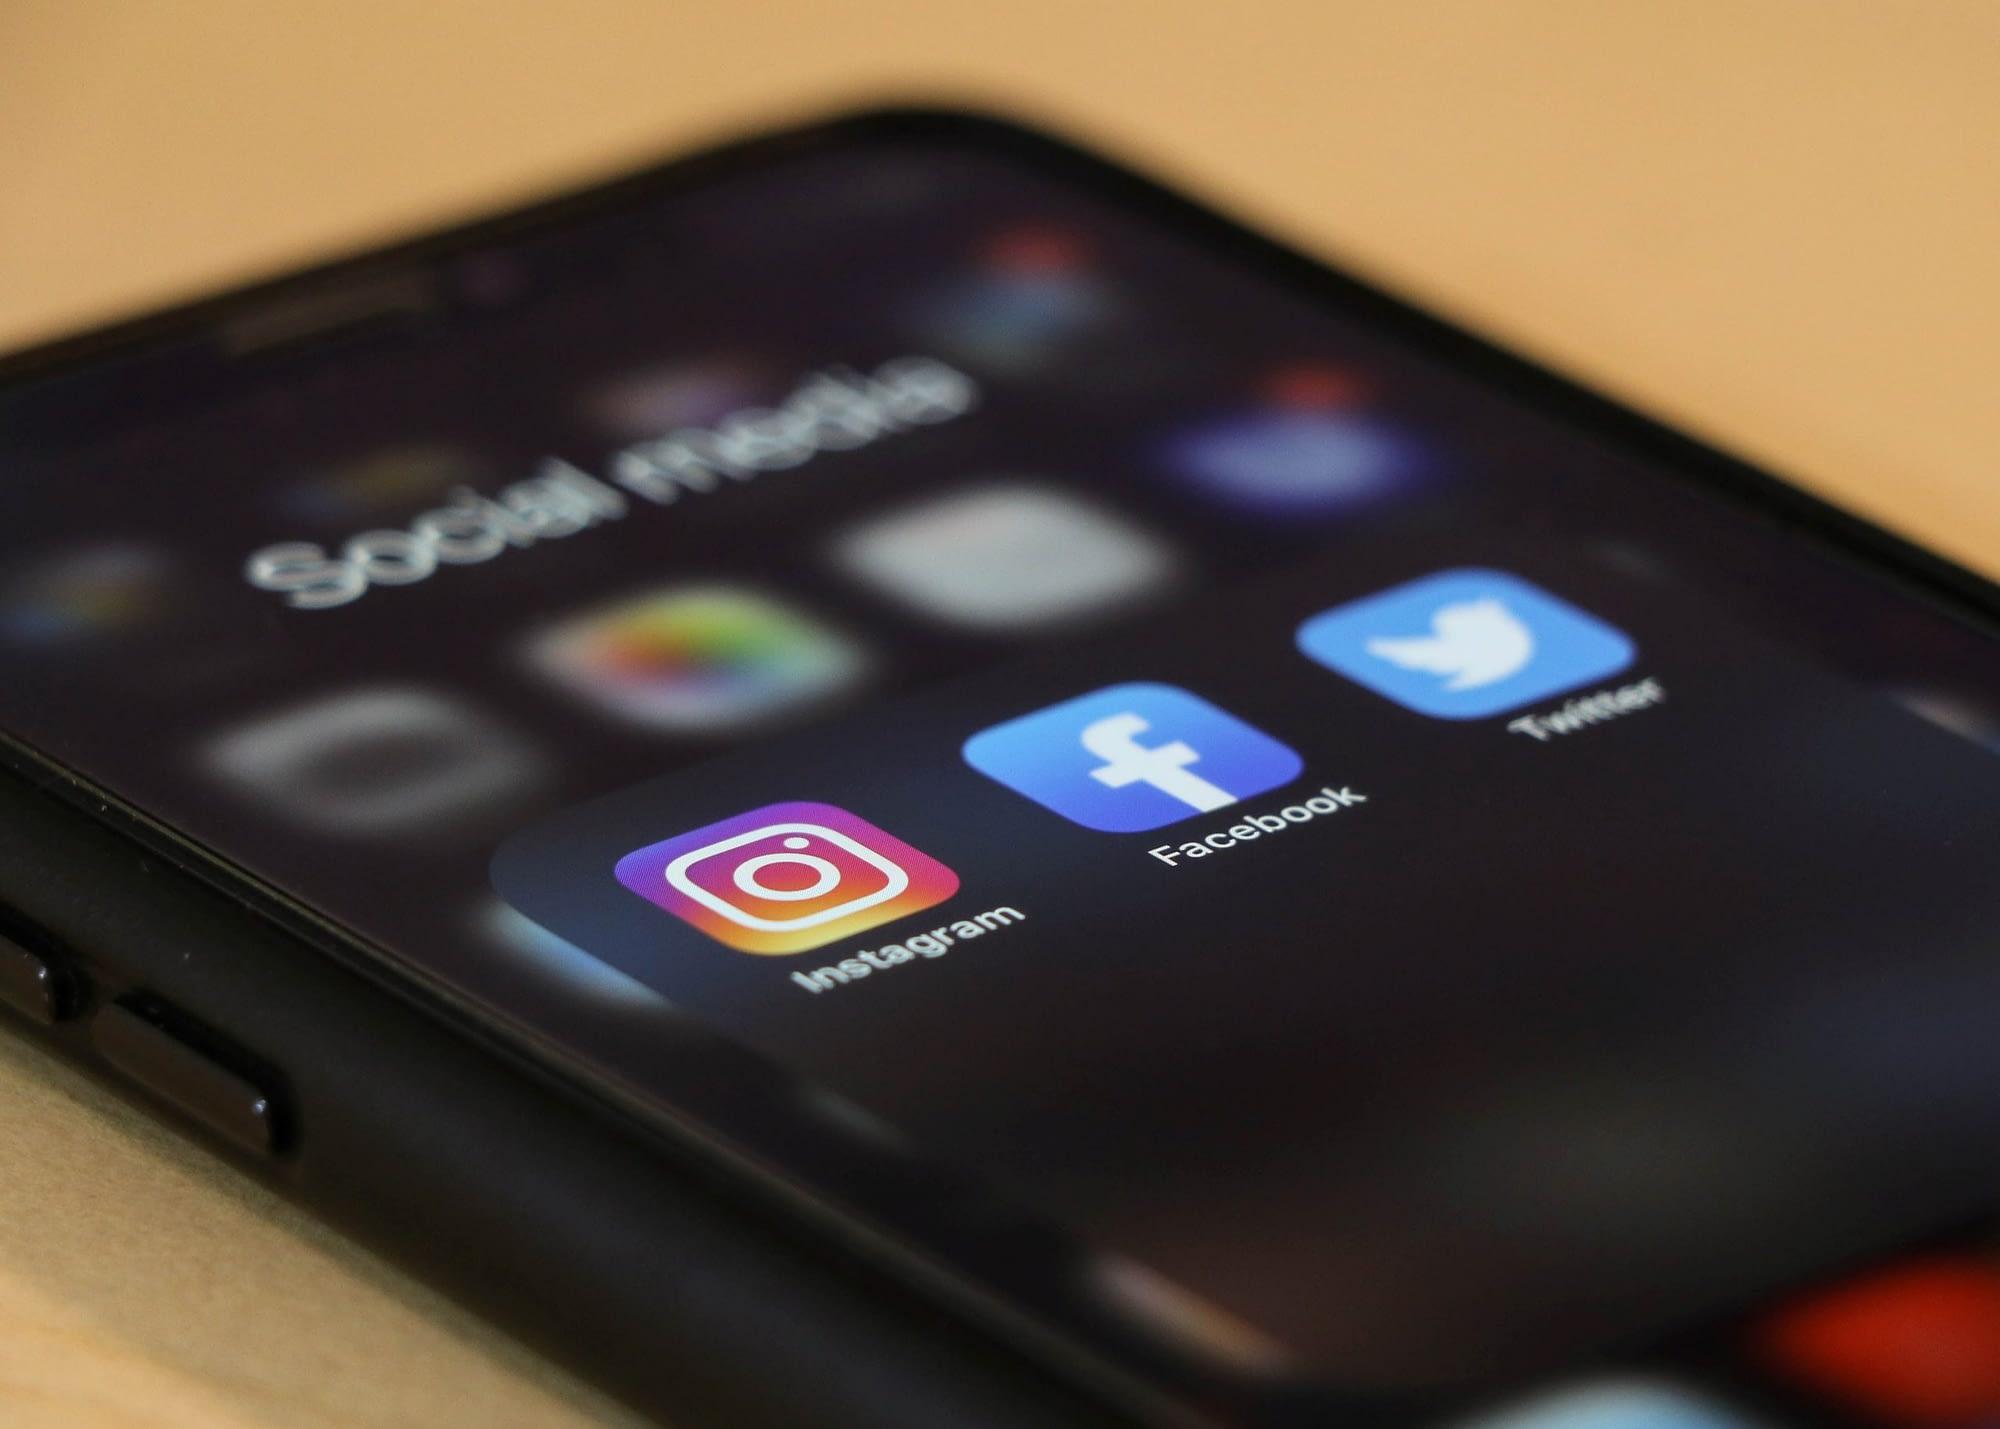 no social media presence